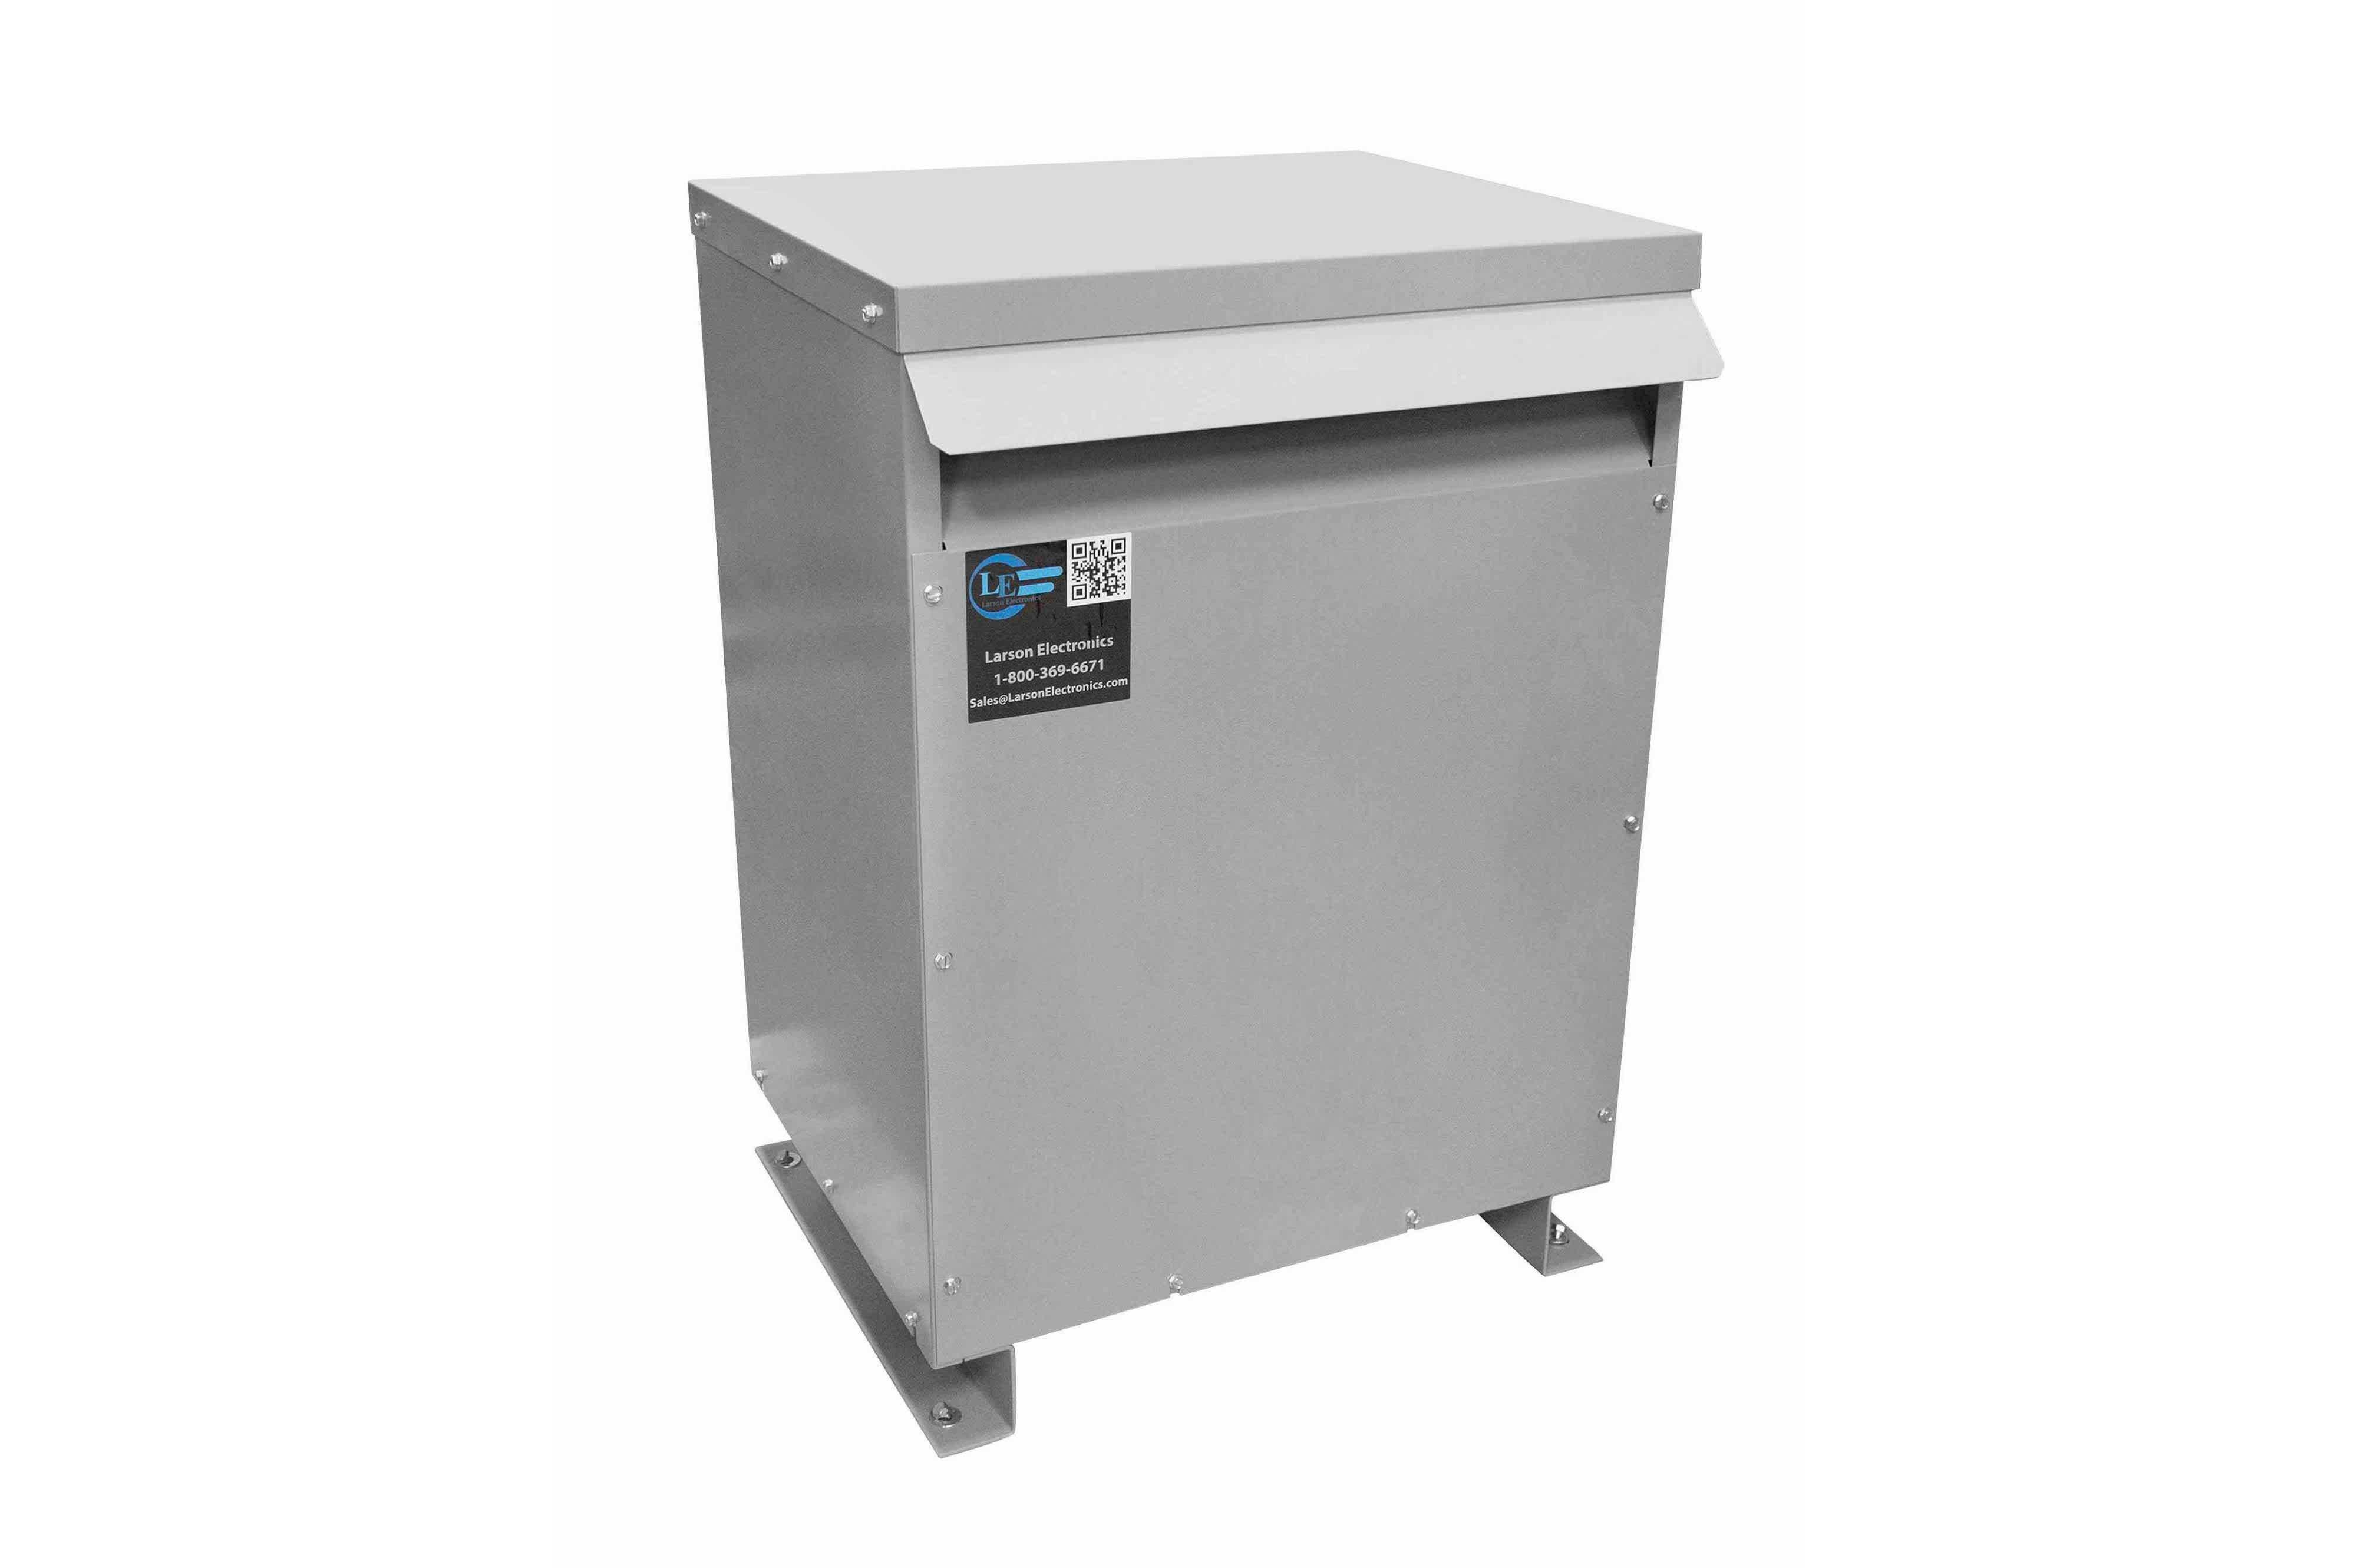 100 kVA 3PH Isolation Transformer, 600V Wye Primary, 380Y/220 Wye-N Secondary, N3R, Ventilated, 60 Hz